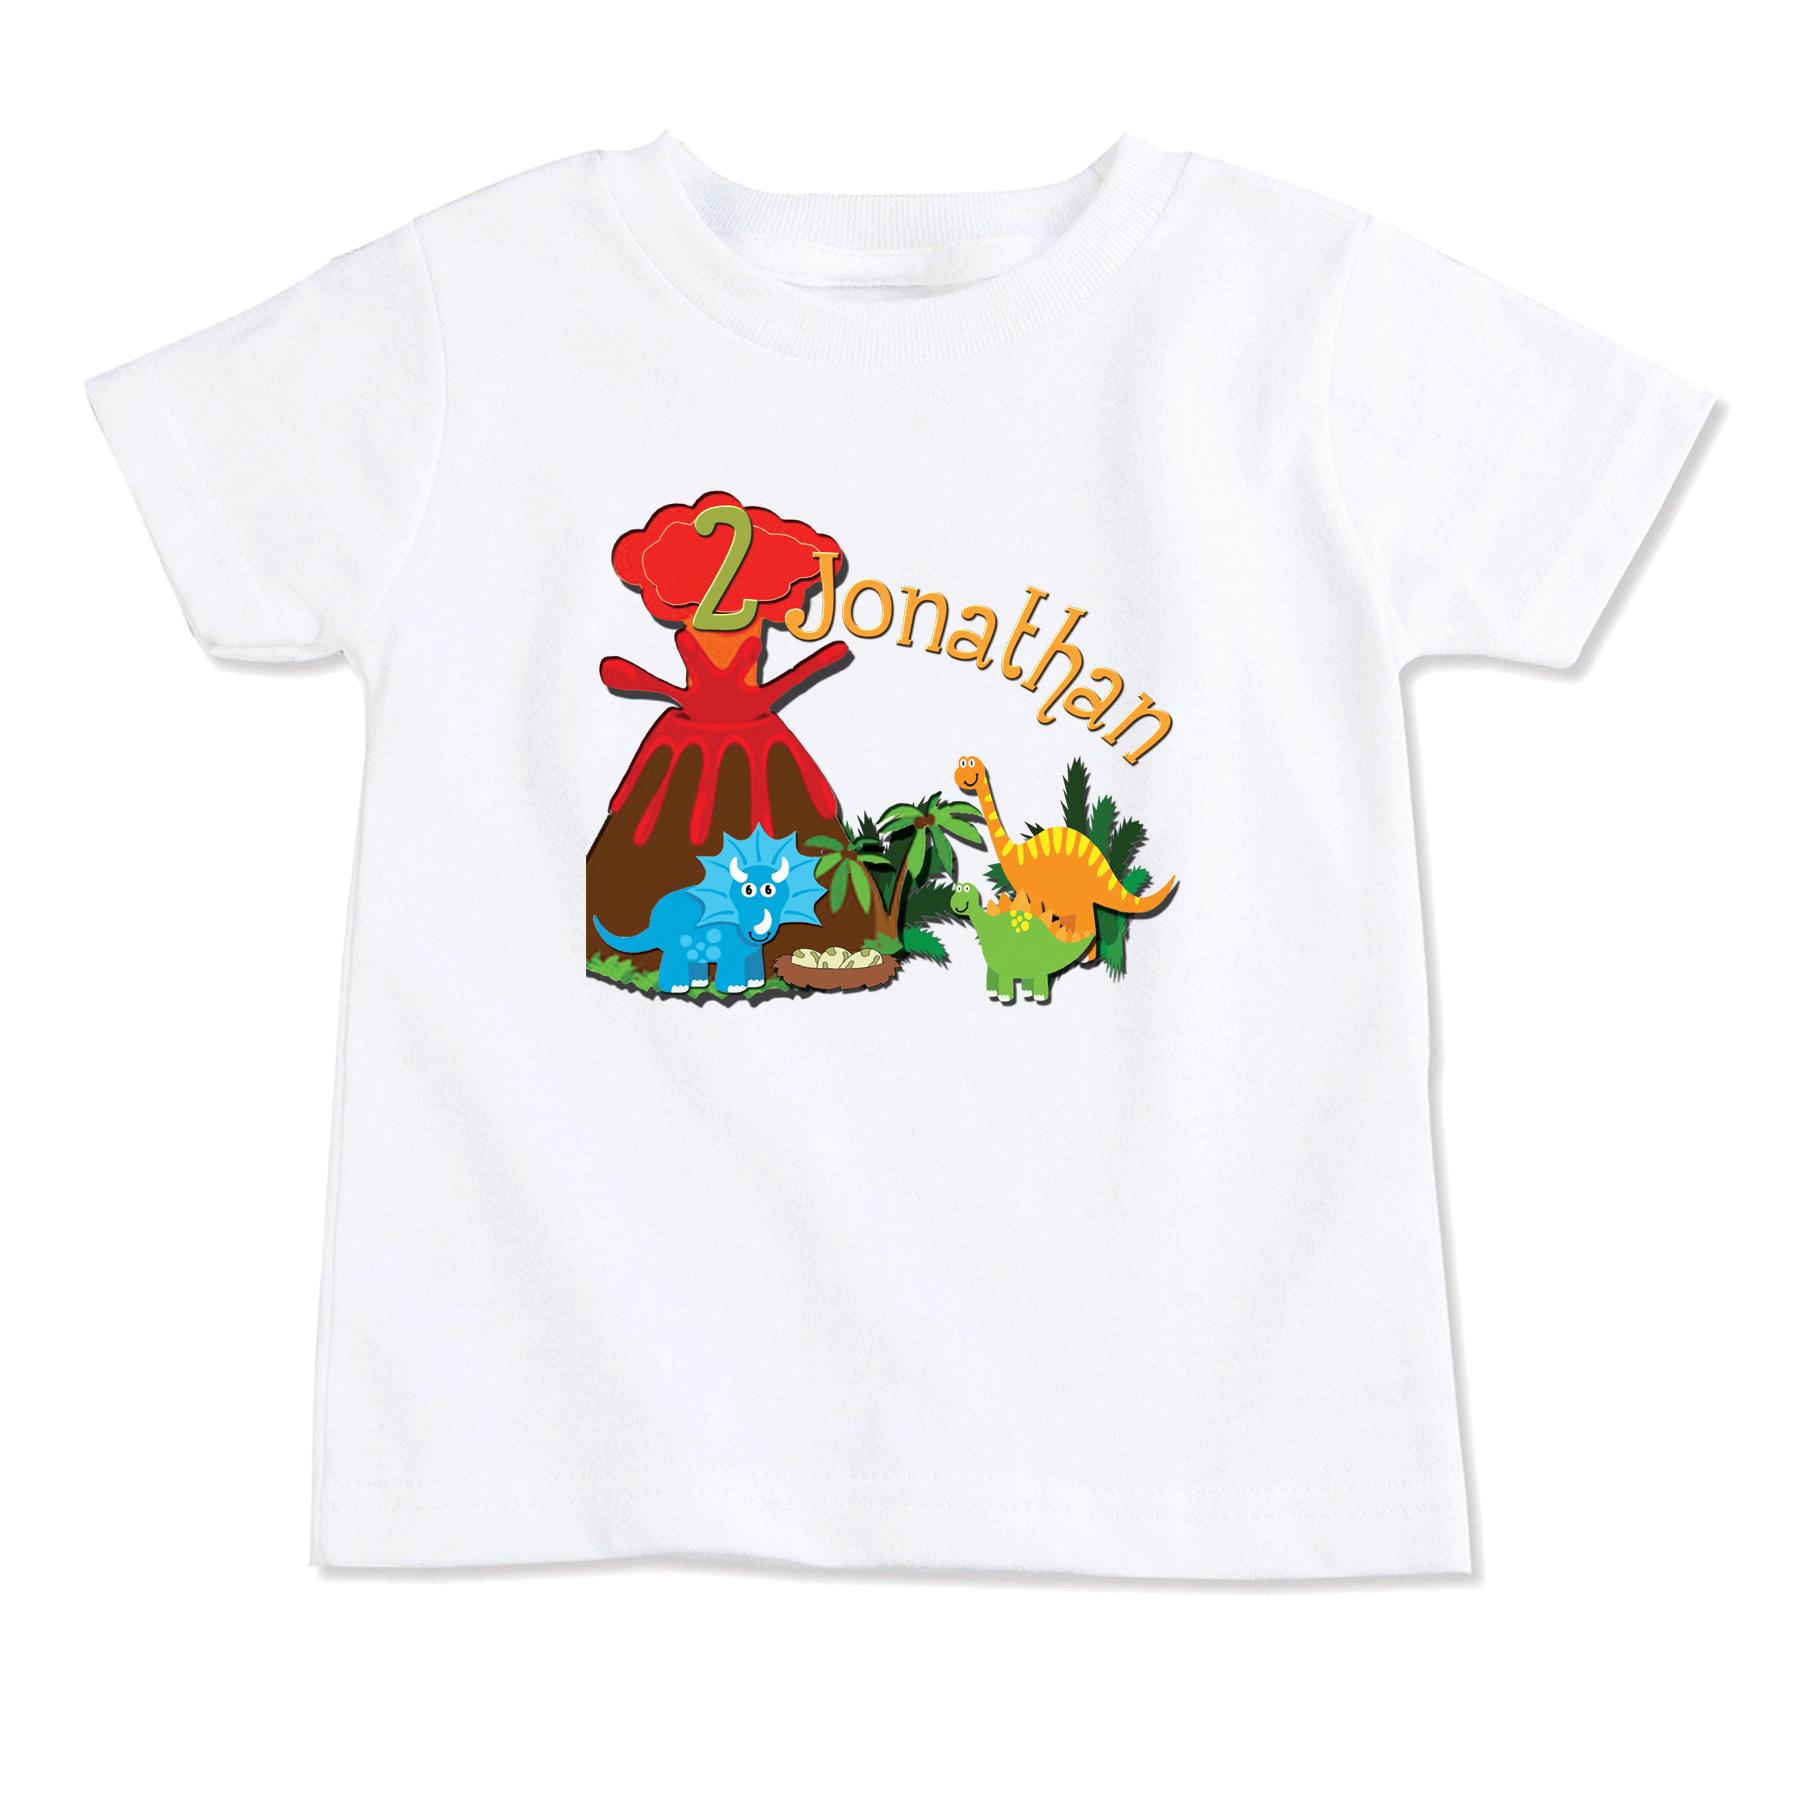 30366a45e Dino Baby T-Shirt,Dinosaur T-Shirt,Birthday T-Shirt,Party T-Shirt ...